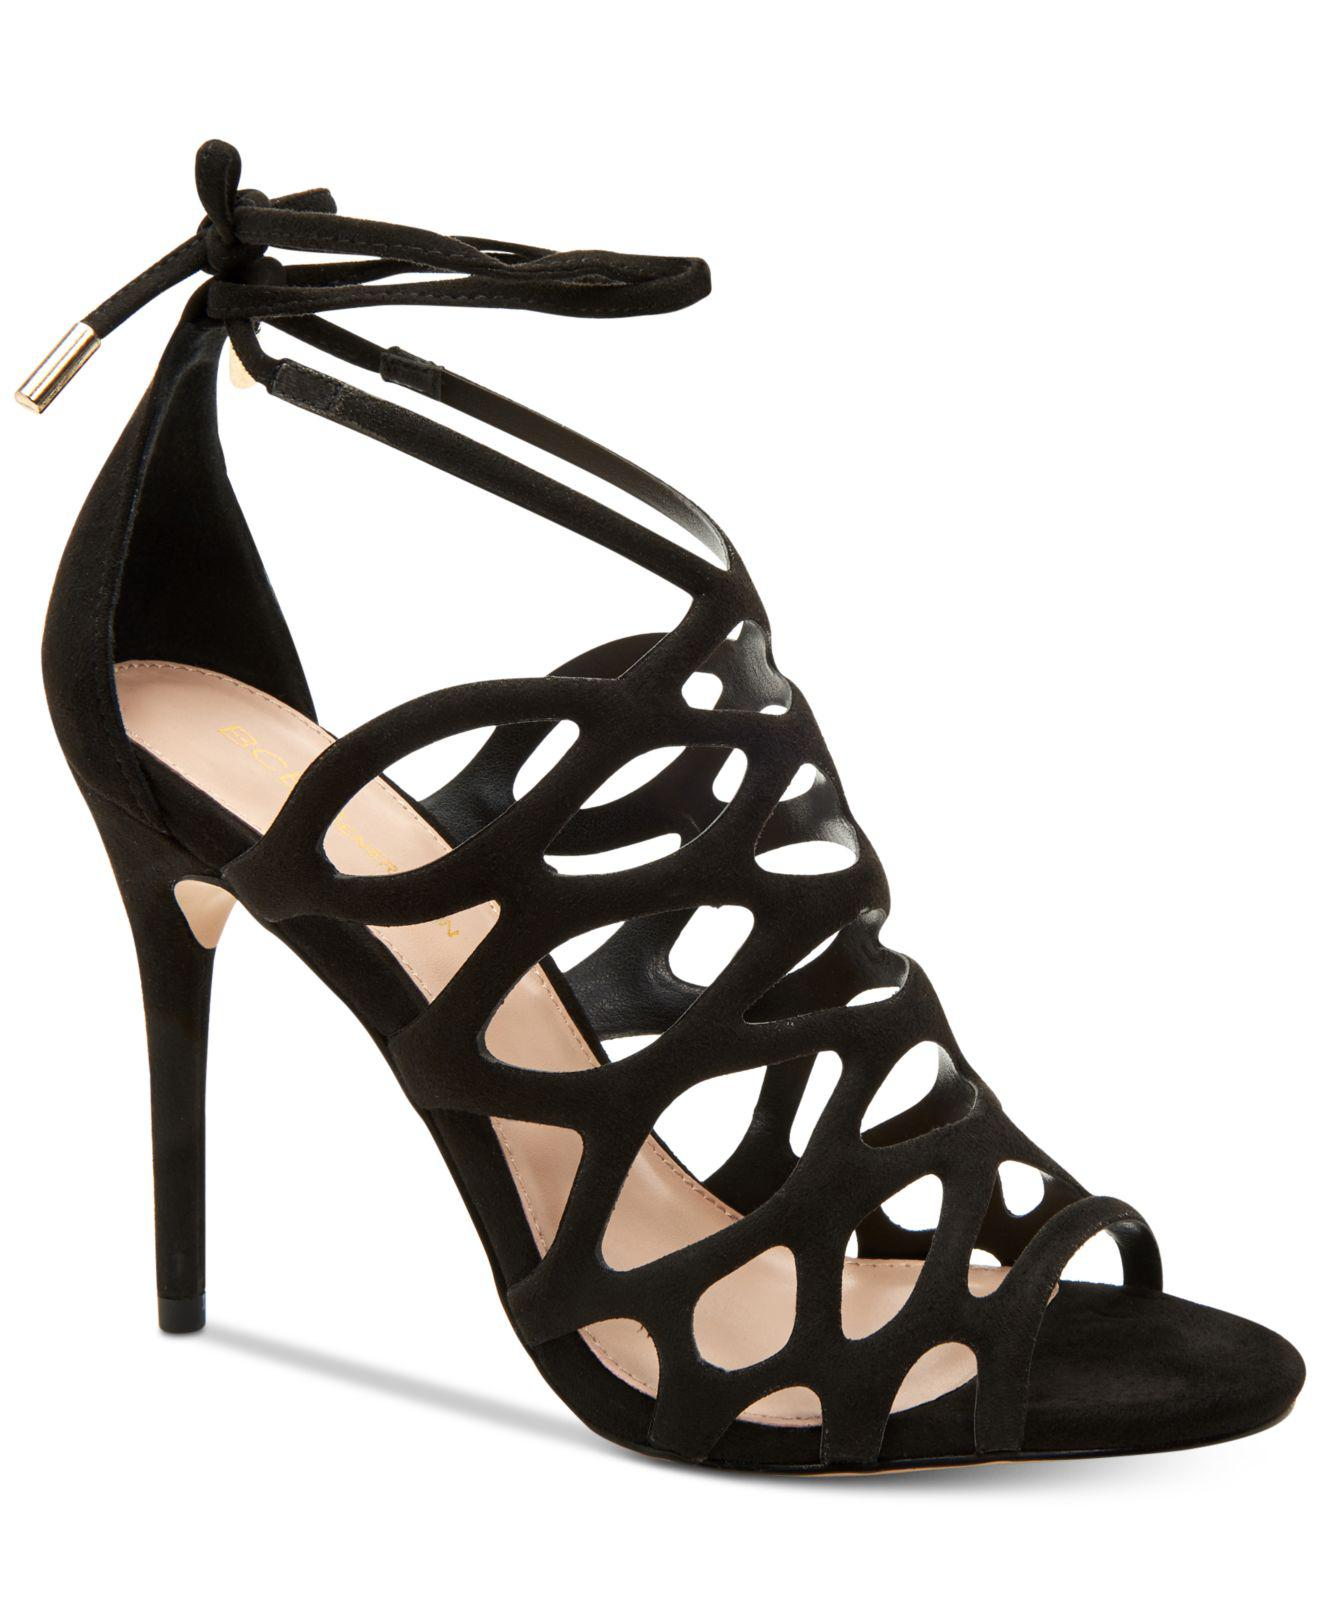 abf7ff15fb Lyst - BCBGeneration Joanna Dress Sandals in Black